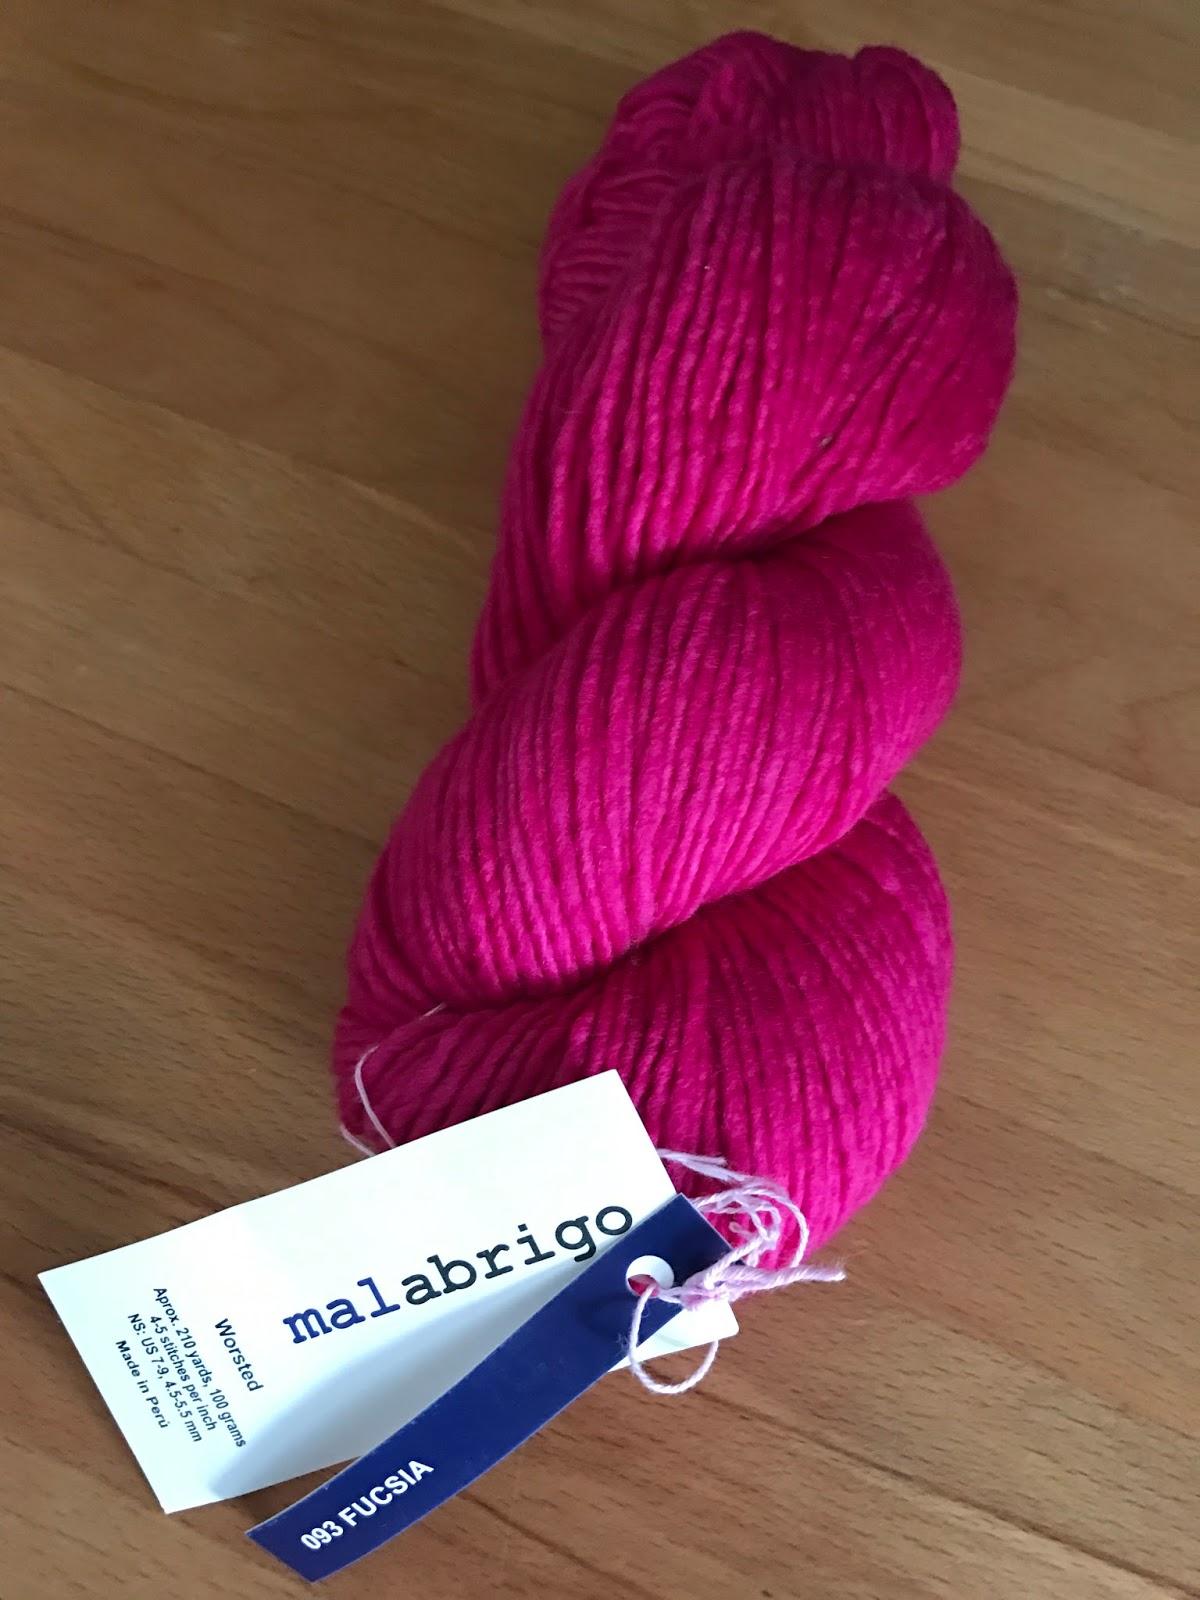 Bona Fide Knitter Time To Knit Again